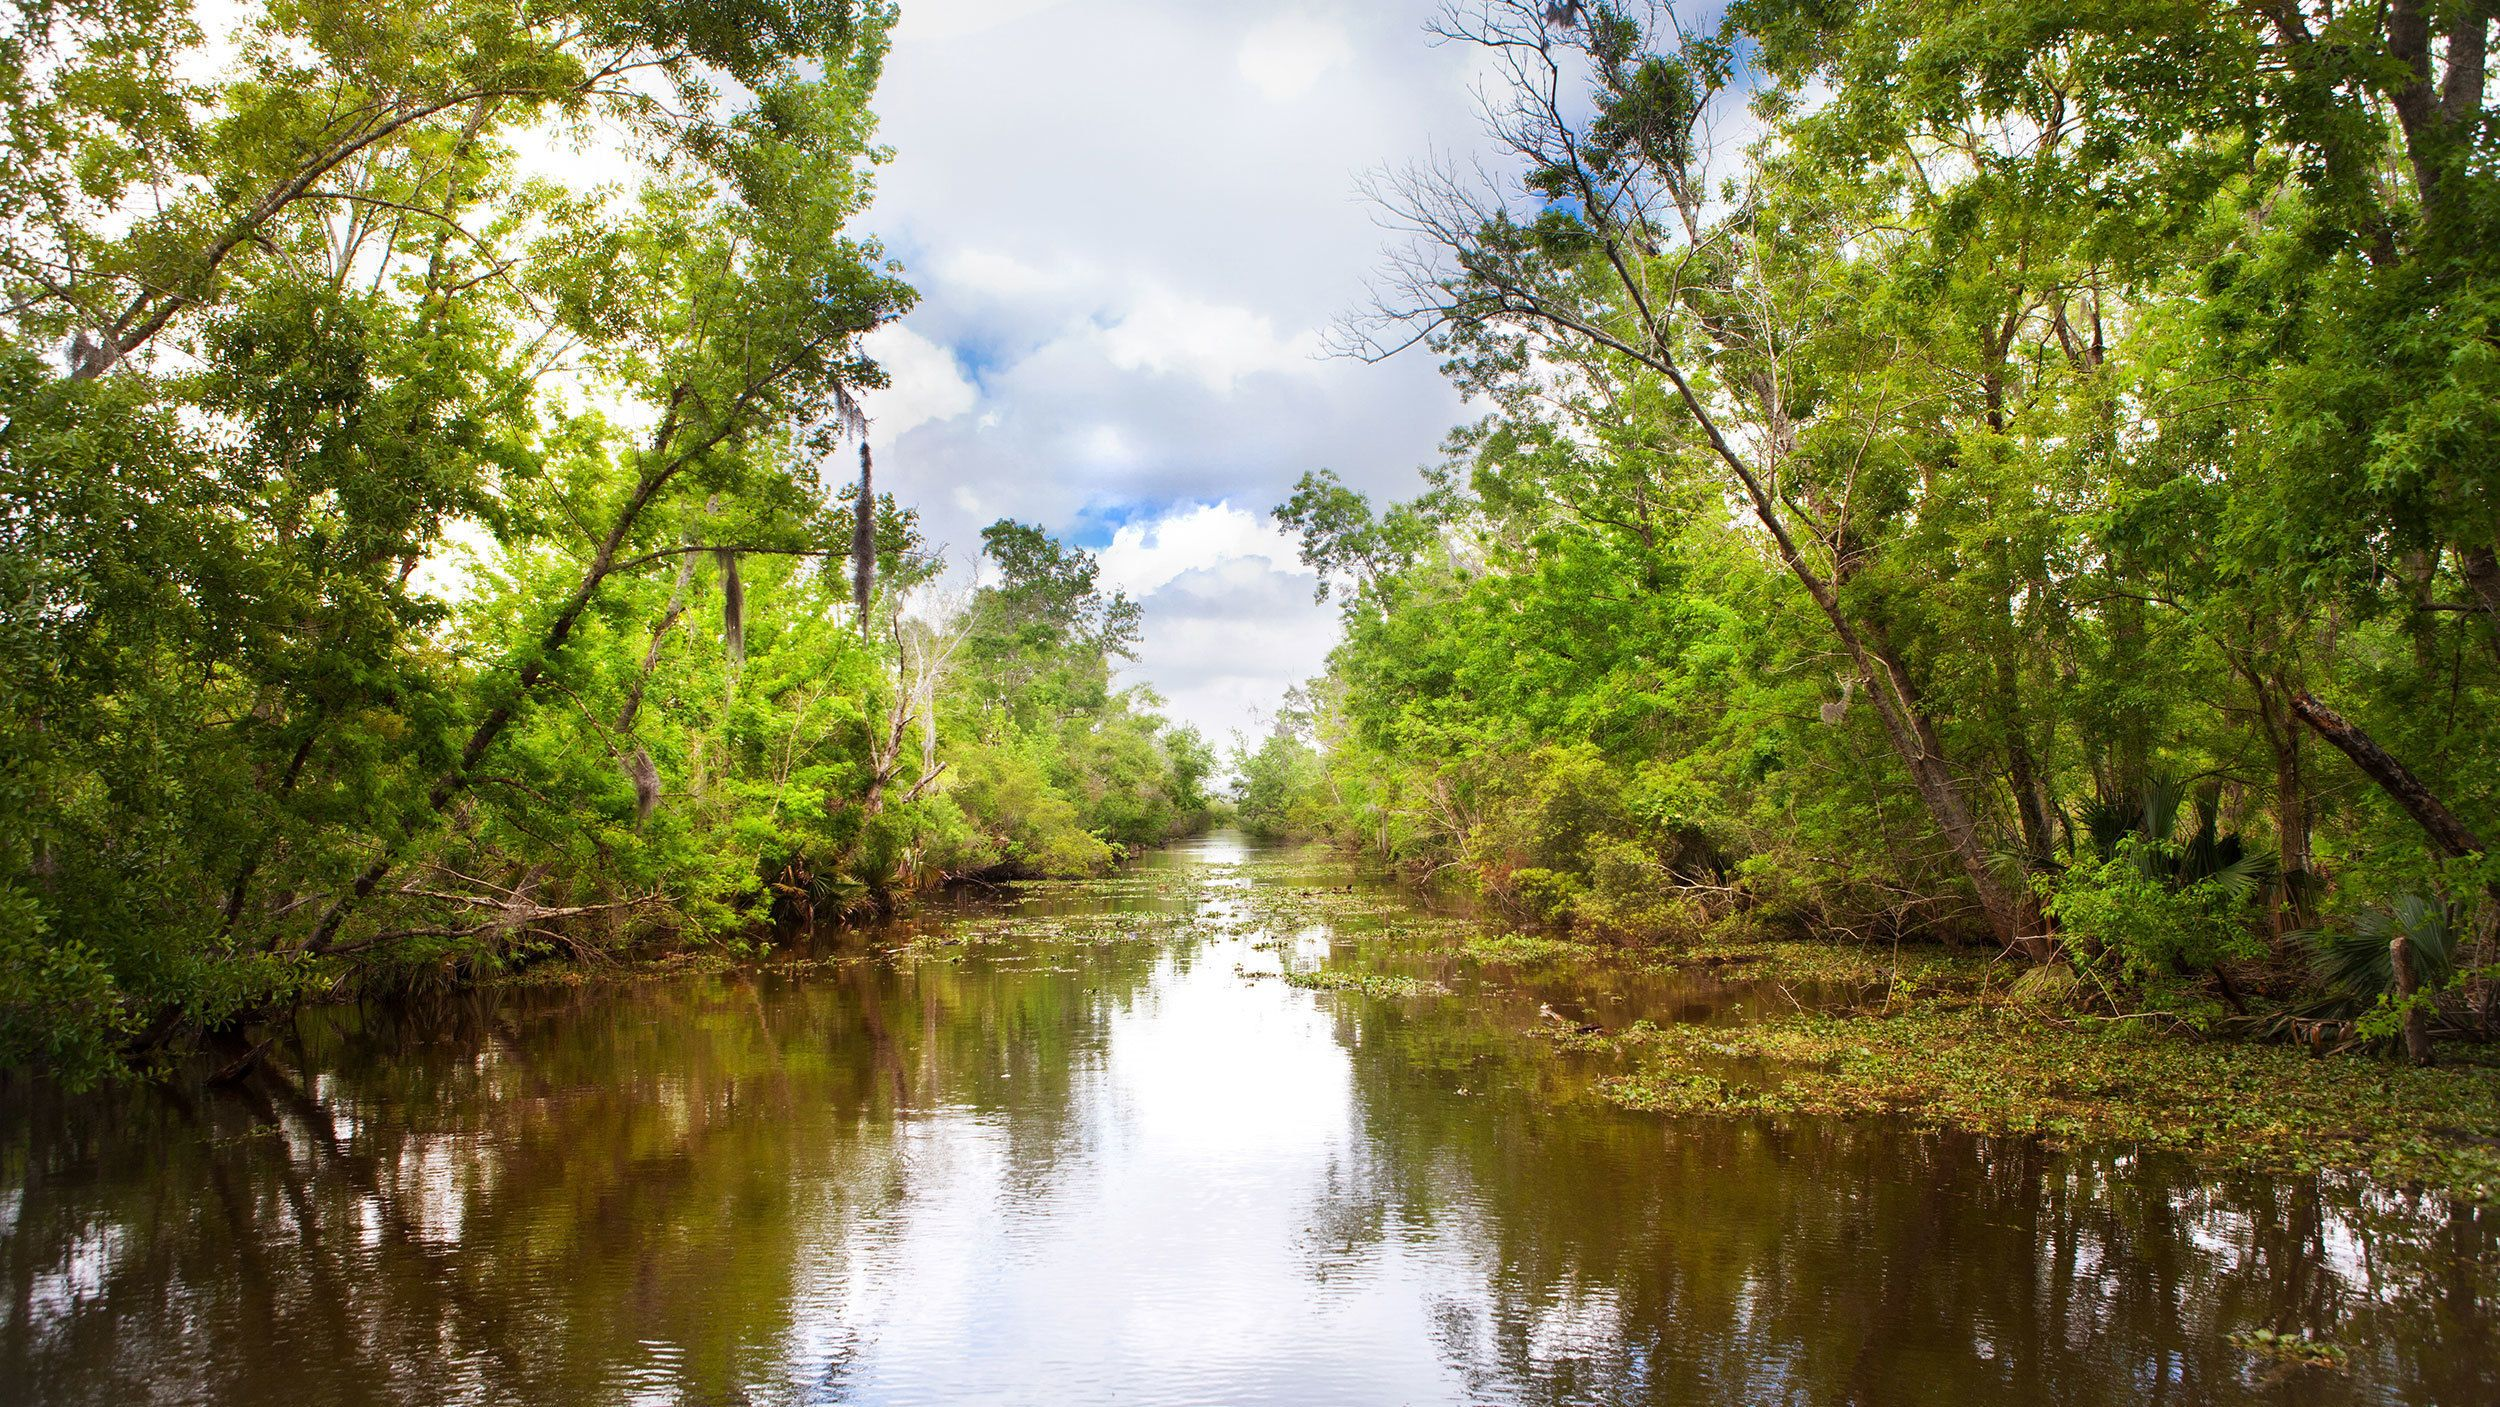 swamp bayou in New Orleans